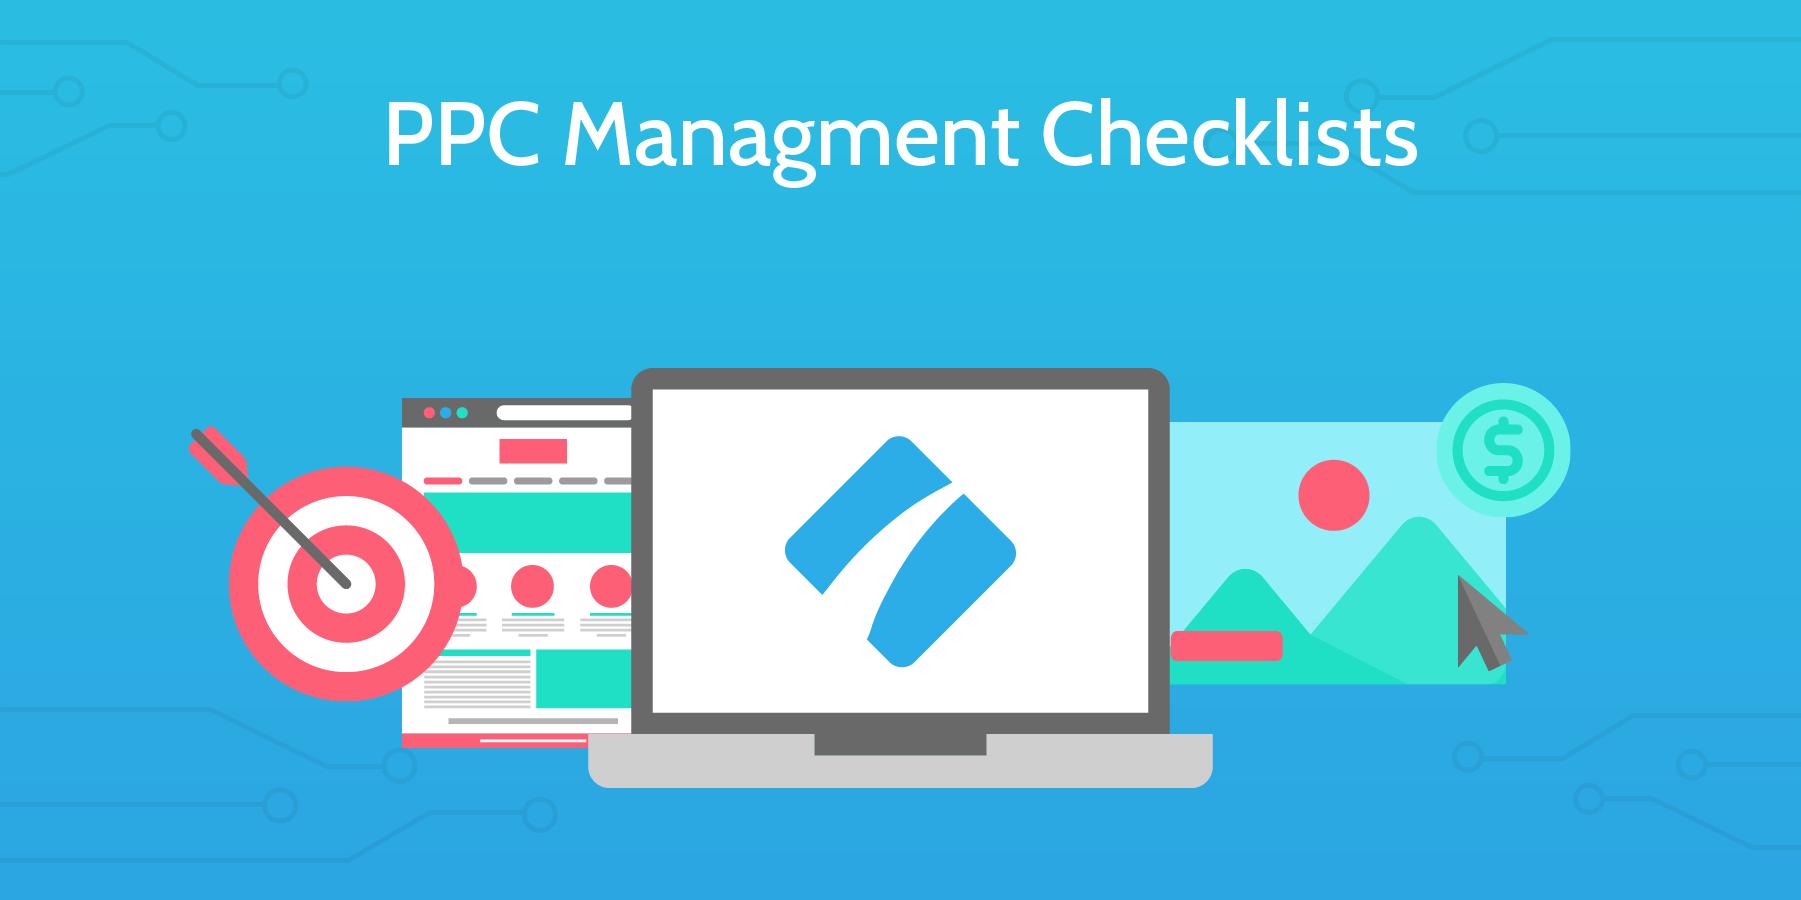 PPC Management Checklists